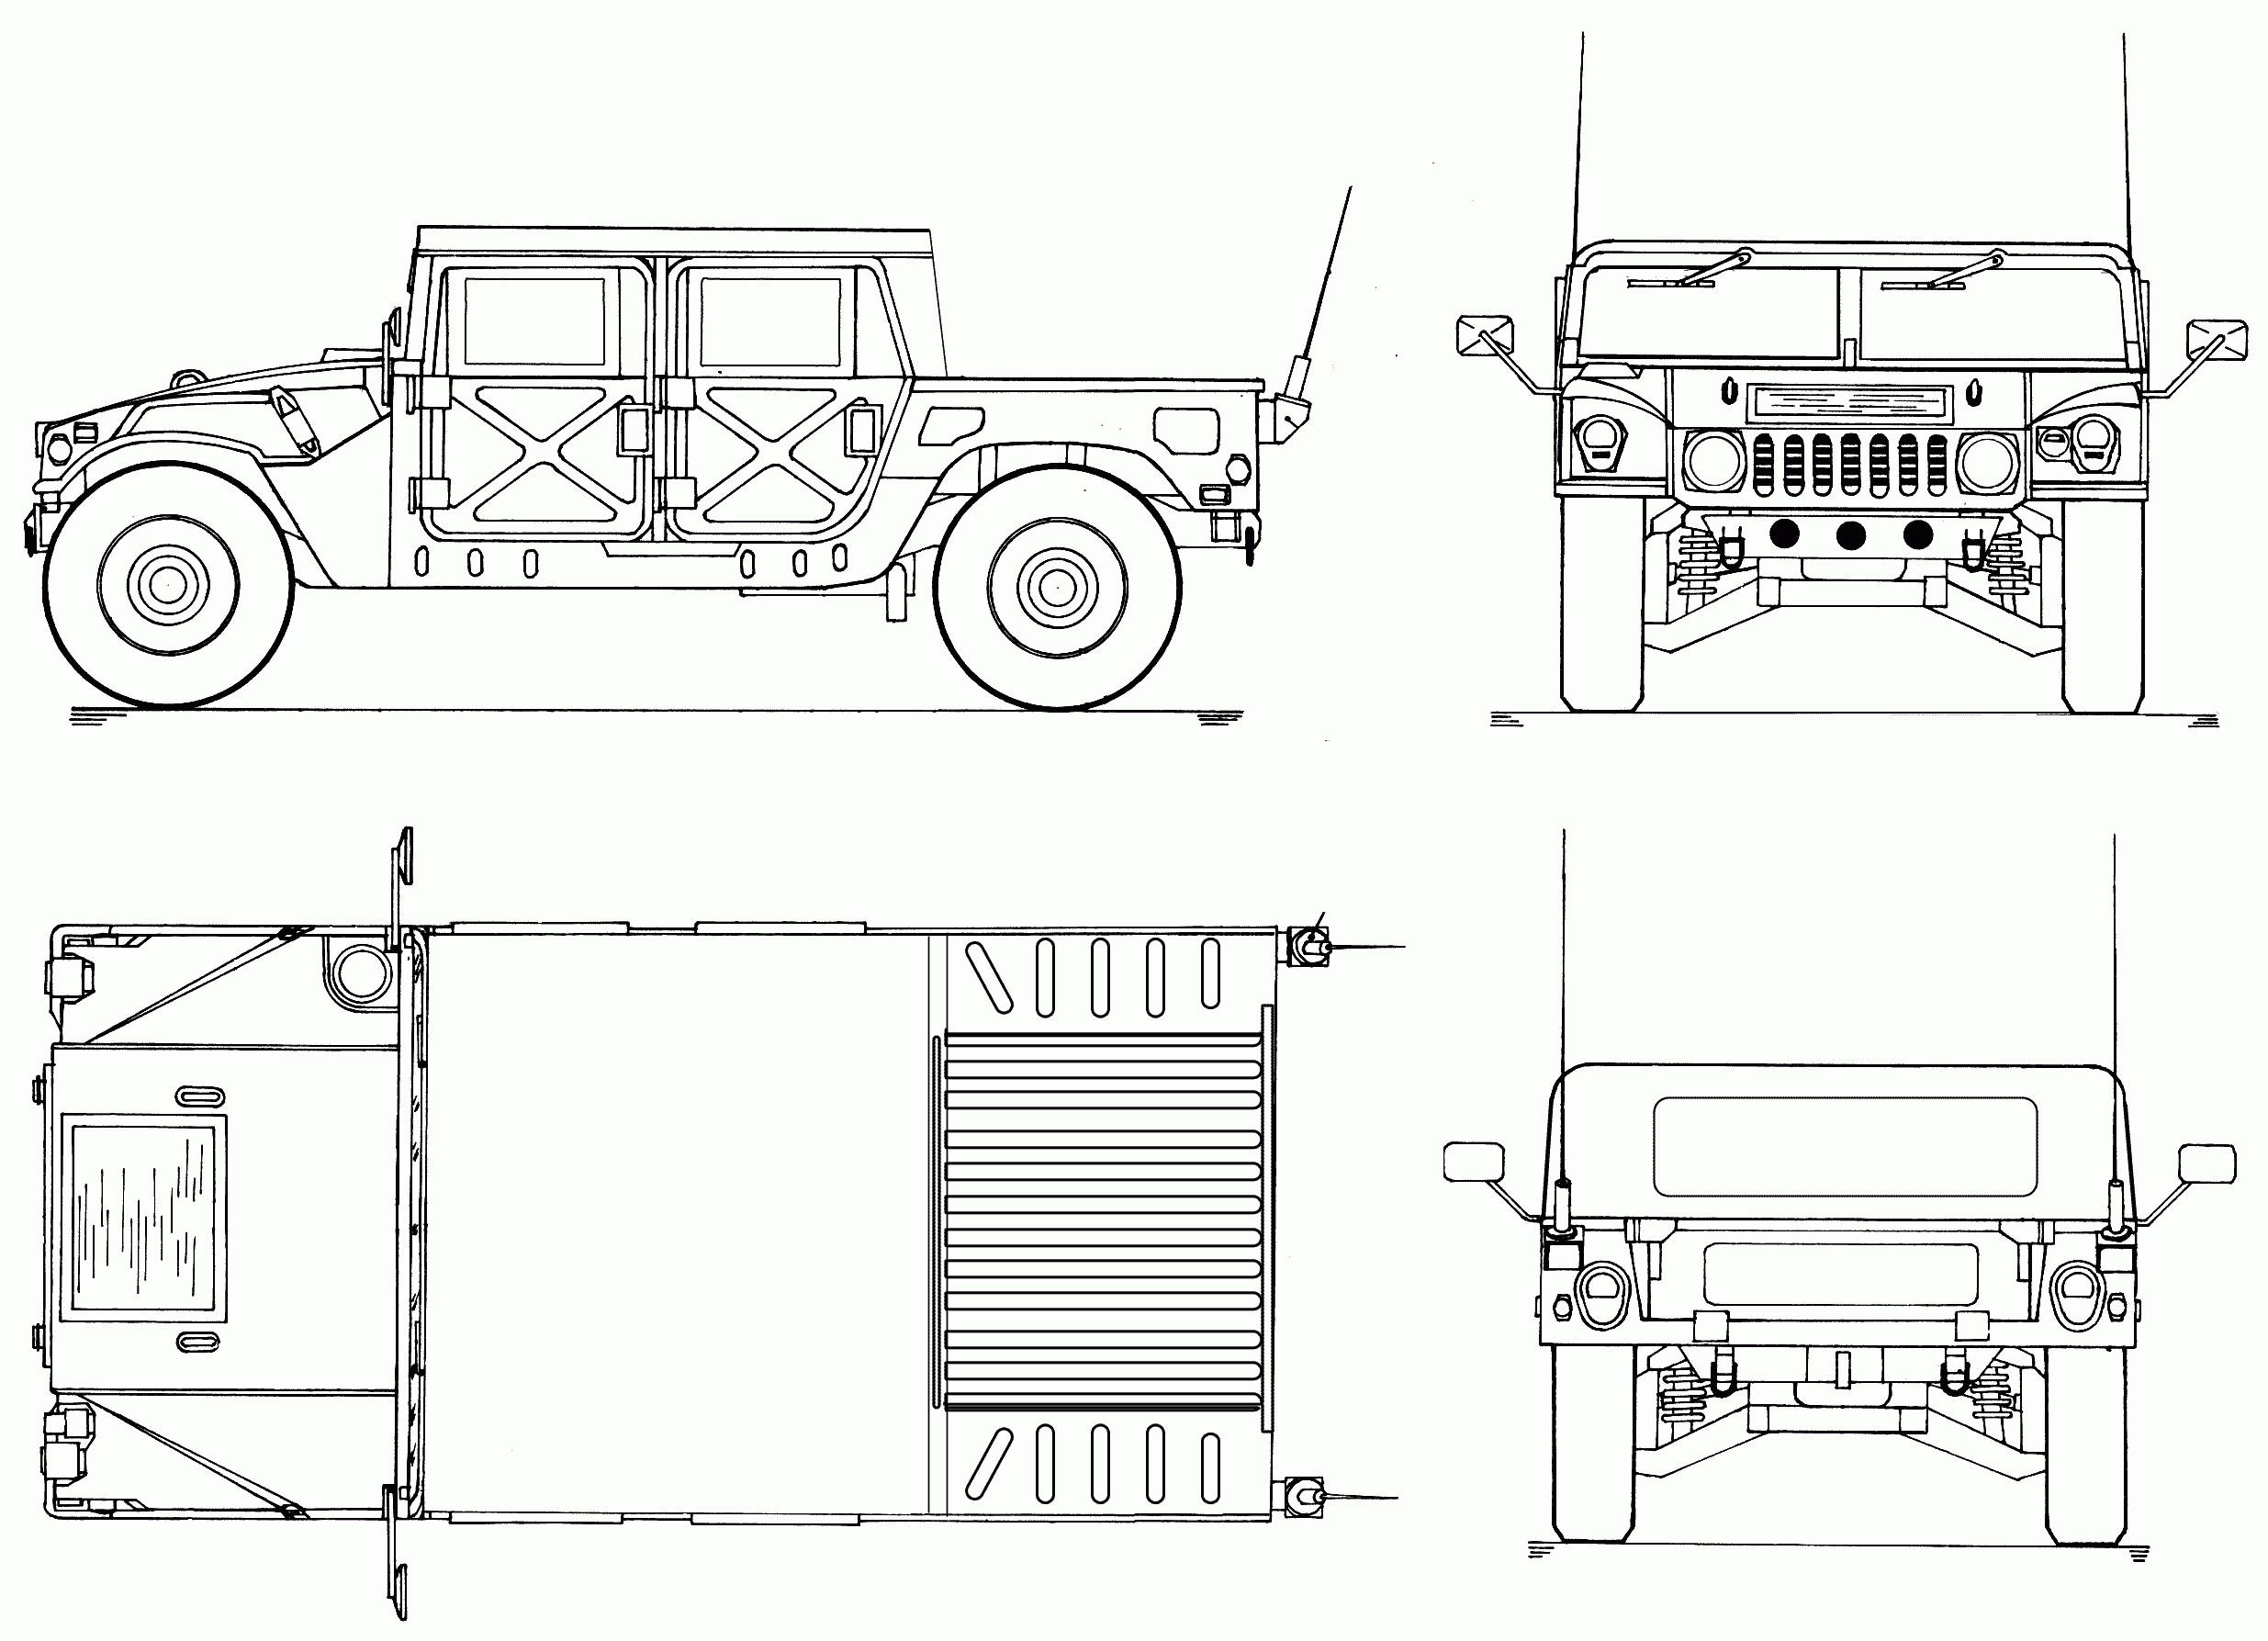 Hummer H2 Engine Diagram Electric Cooling Fan Conversion